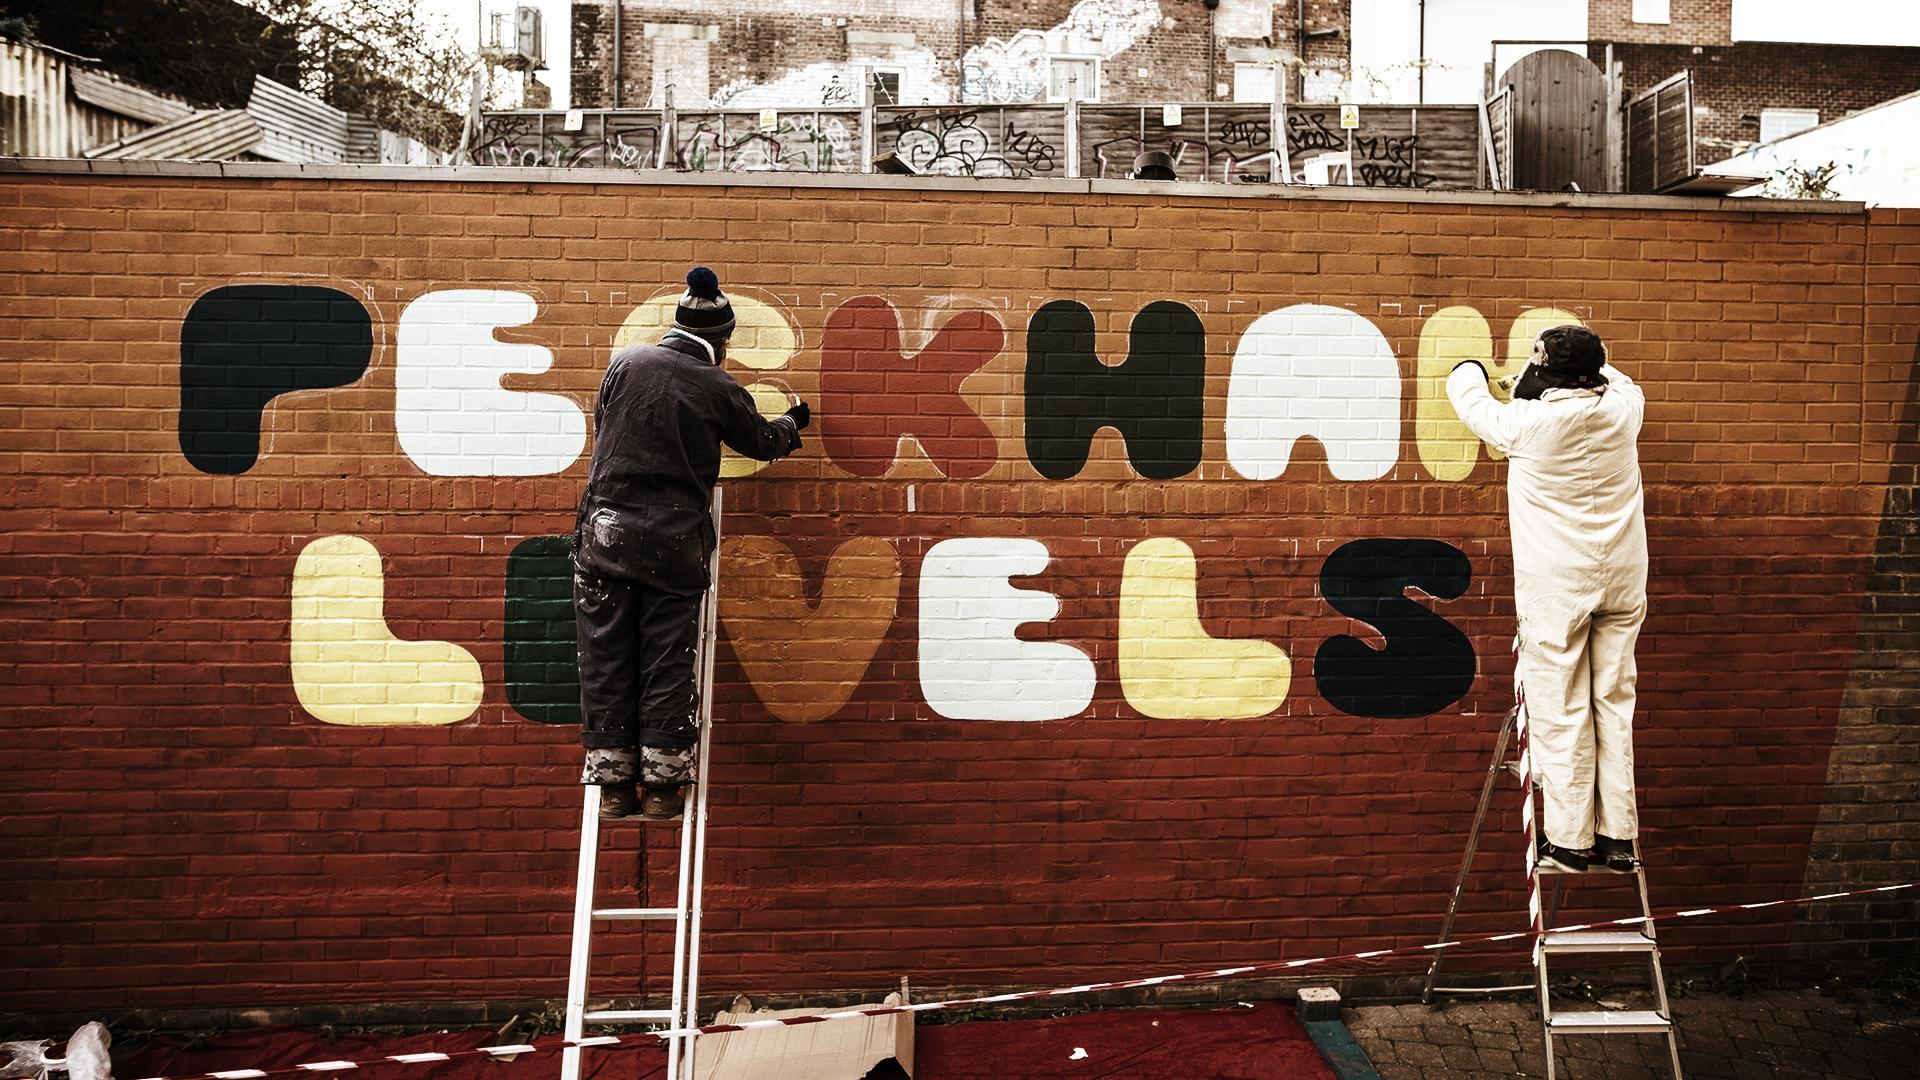 COMMUNITY_  PECKHAM LEVELS.  #Peckham #Community #Working #Foodies #LivingSpace   http://www.peckhamlevels.org